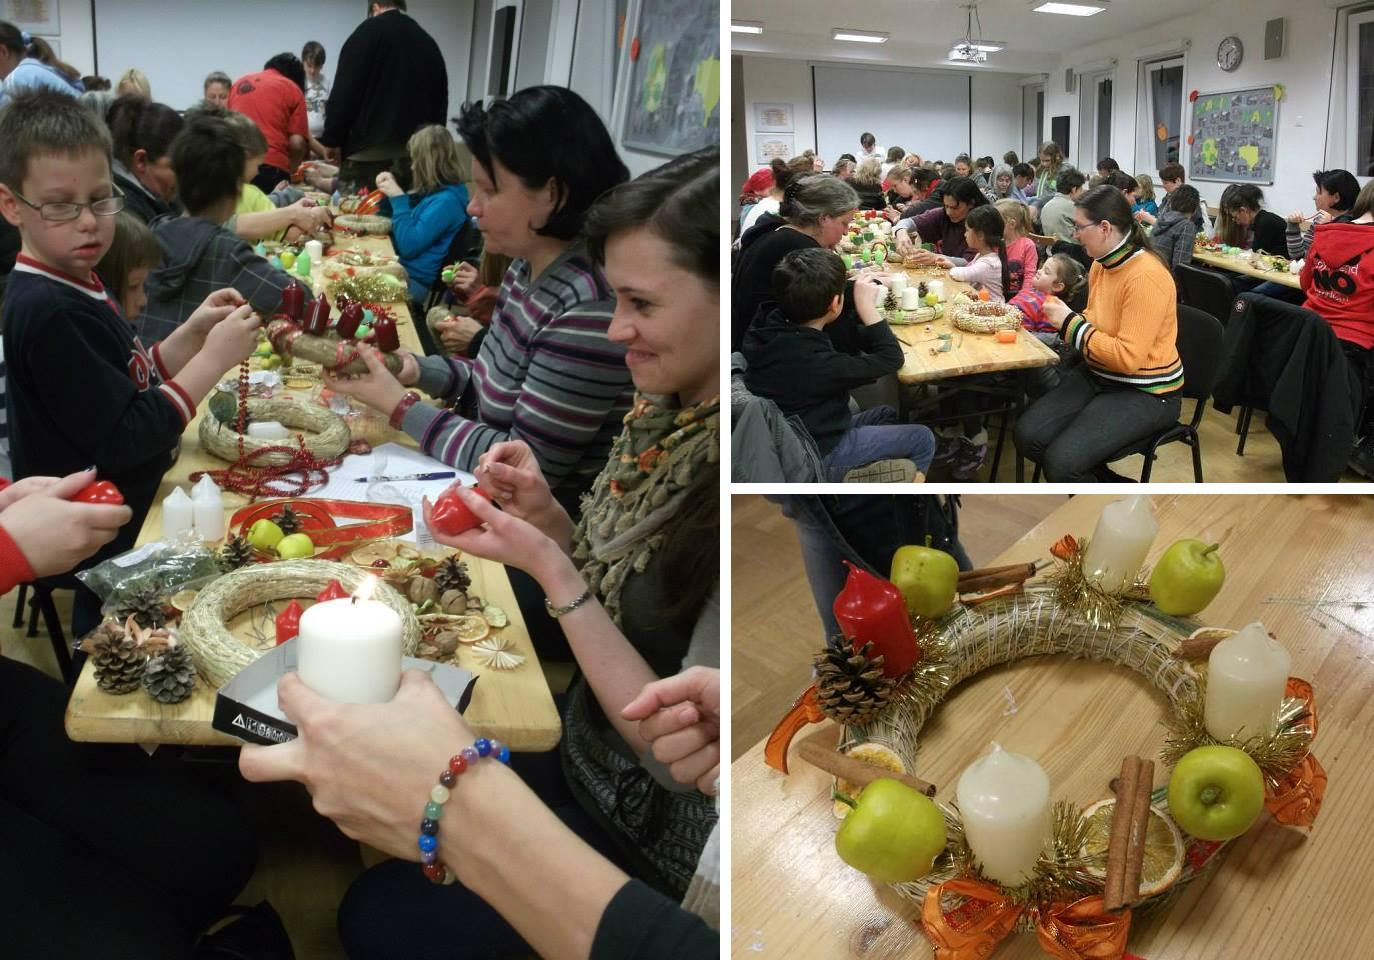 2014.11.27_PKH_adventi_koszoru_keszites_tablo